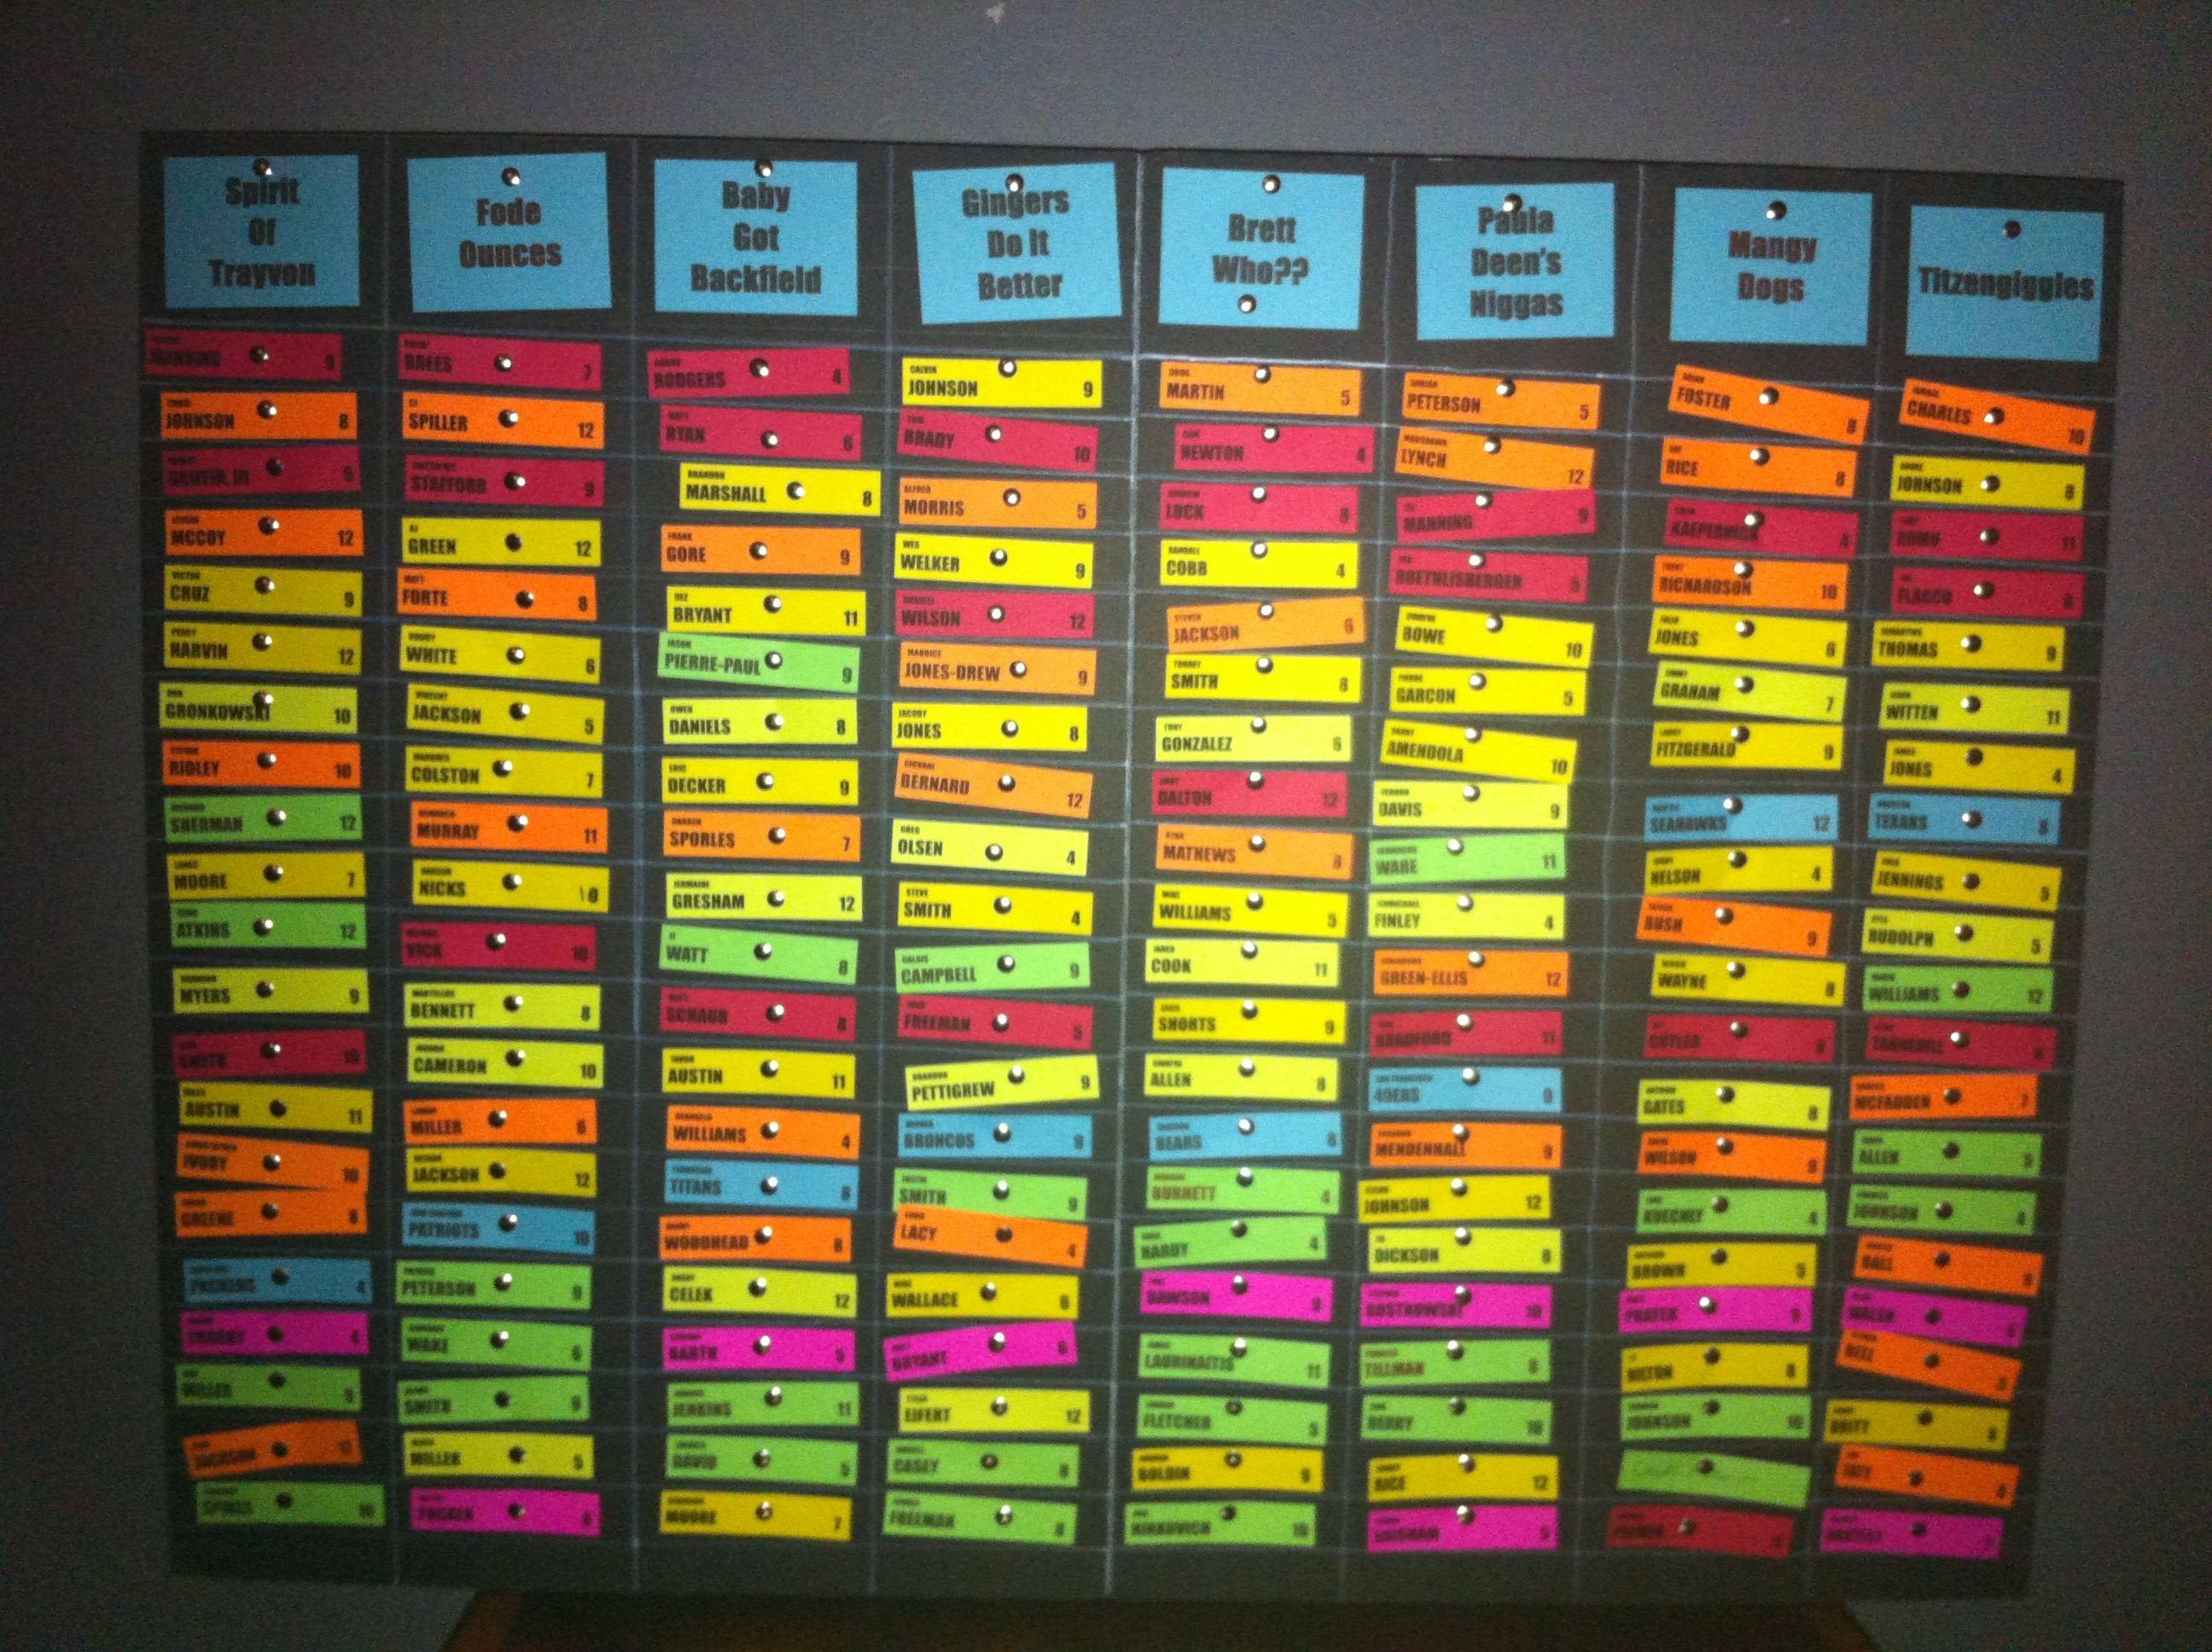 Fantasy Football Live Draft Board. Foam Board, Colored Card Stock - Free Fantasy Football Draft Kit Printable